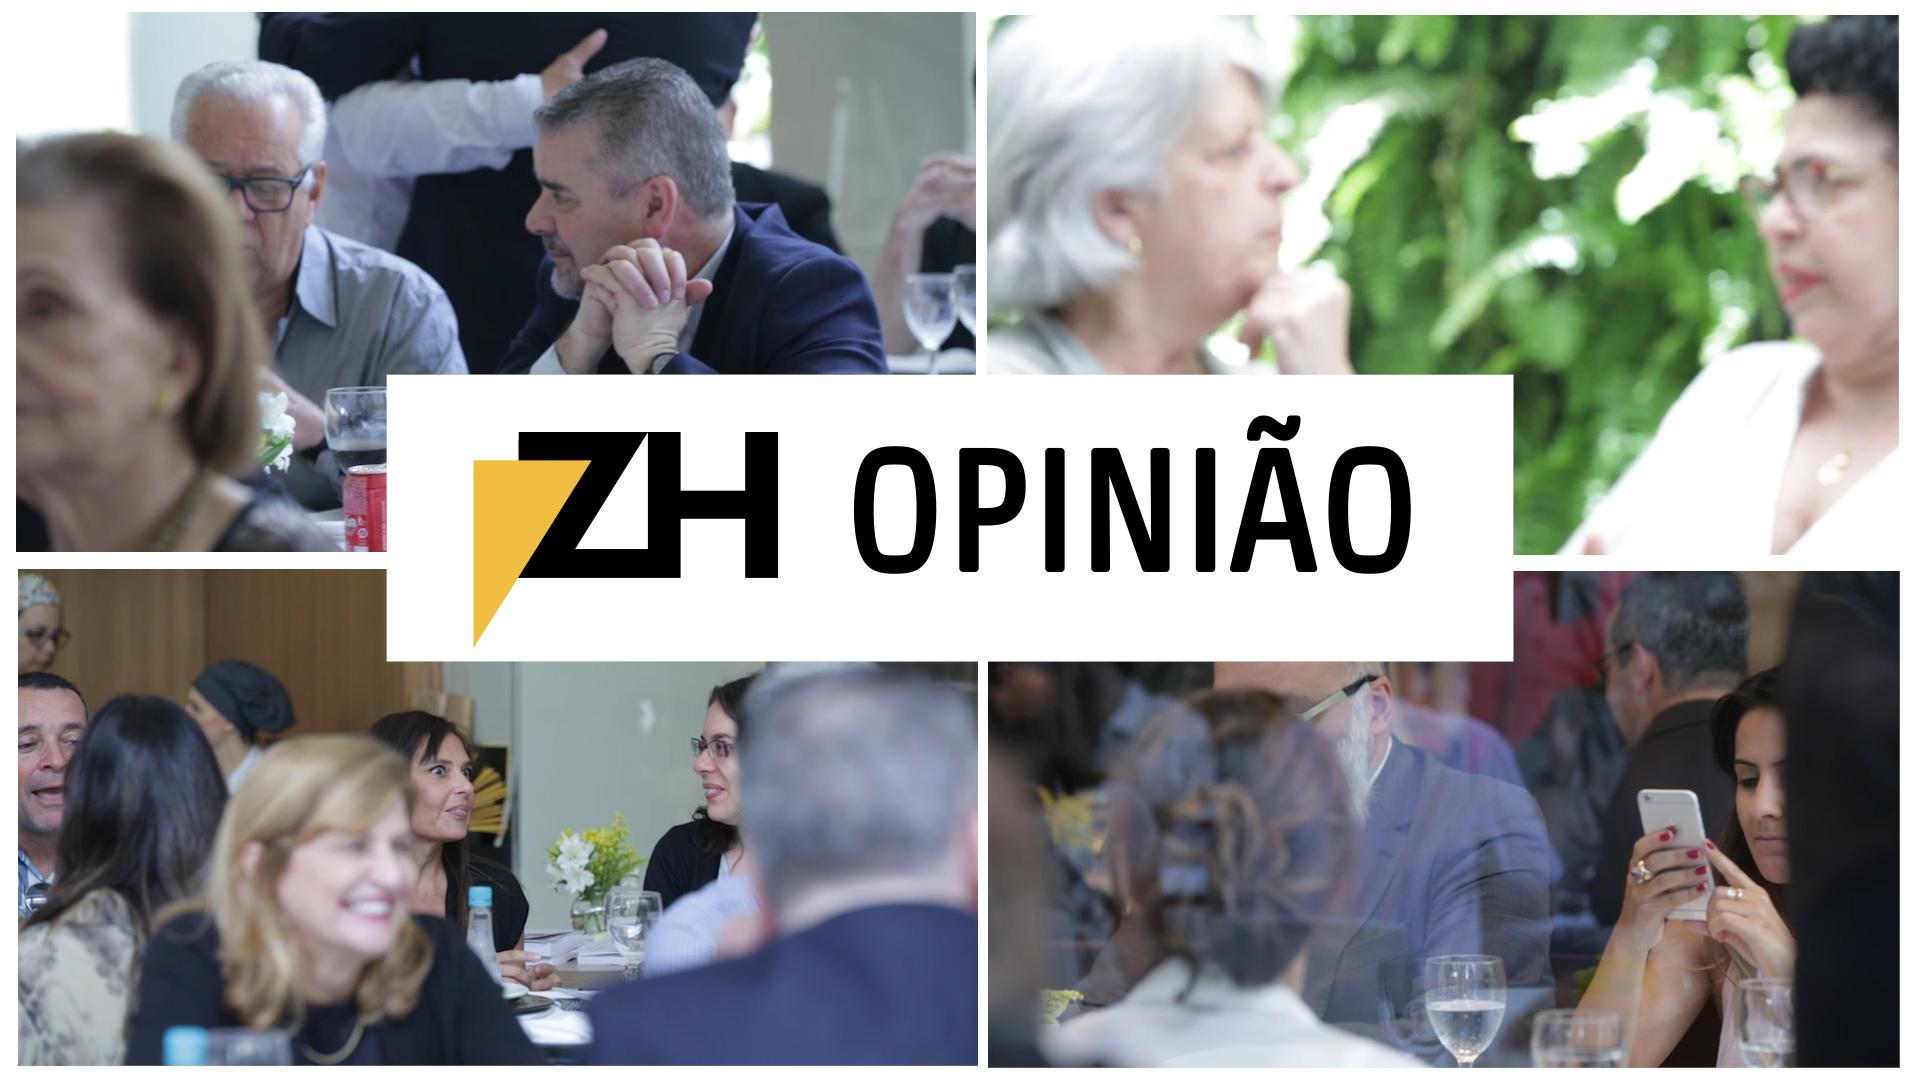 Encontro de colunistas de ZH